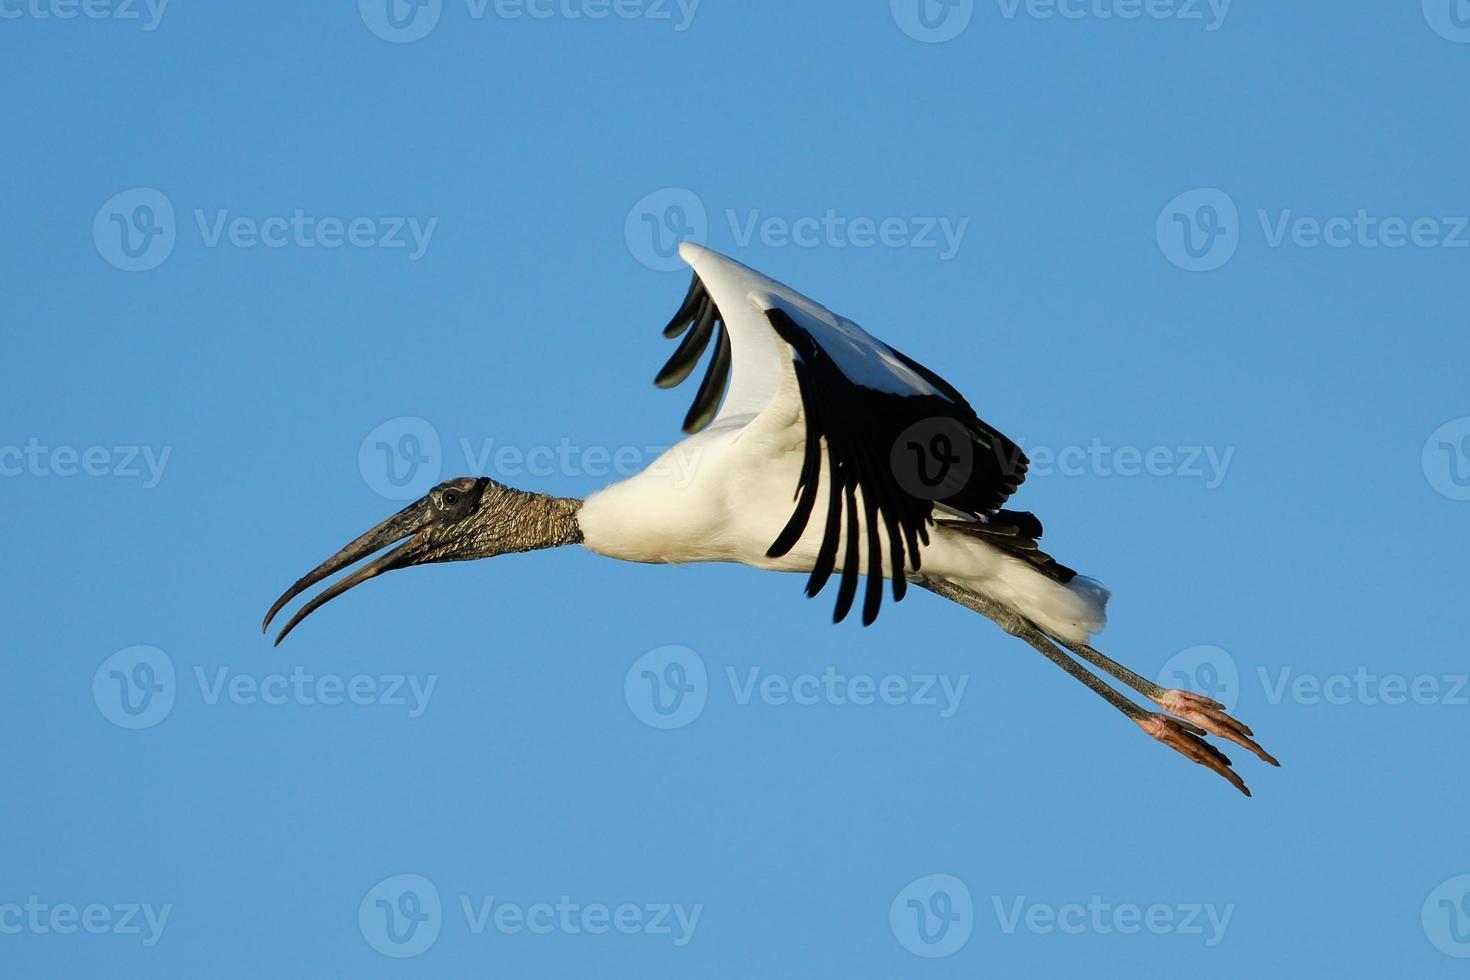 Wood stork flying in blue sky photo